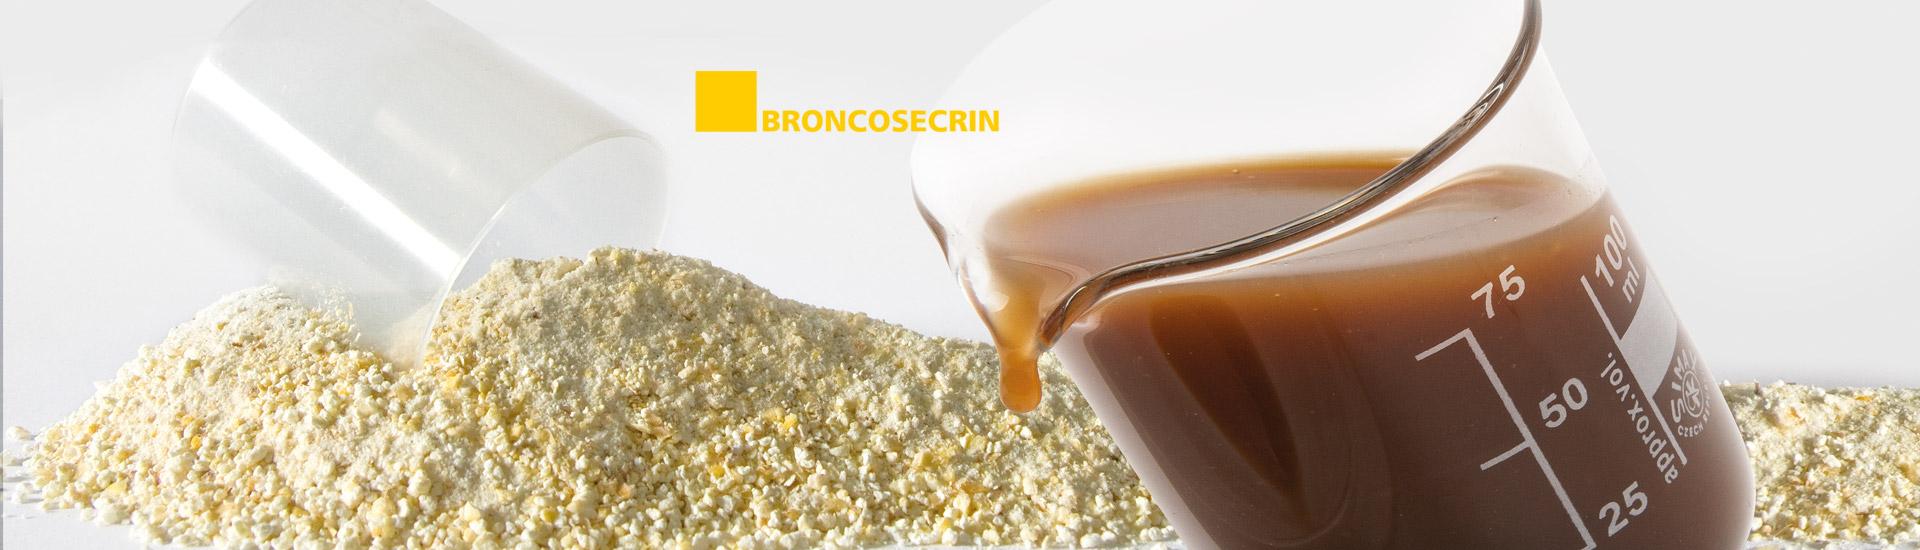 equinova-broncosecrin